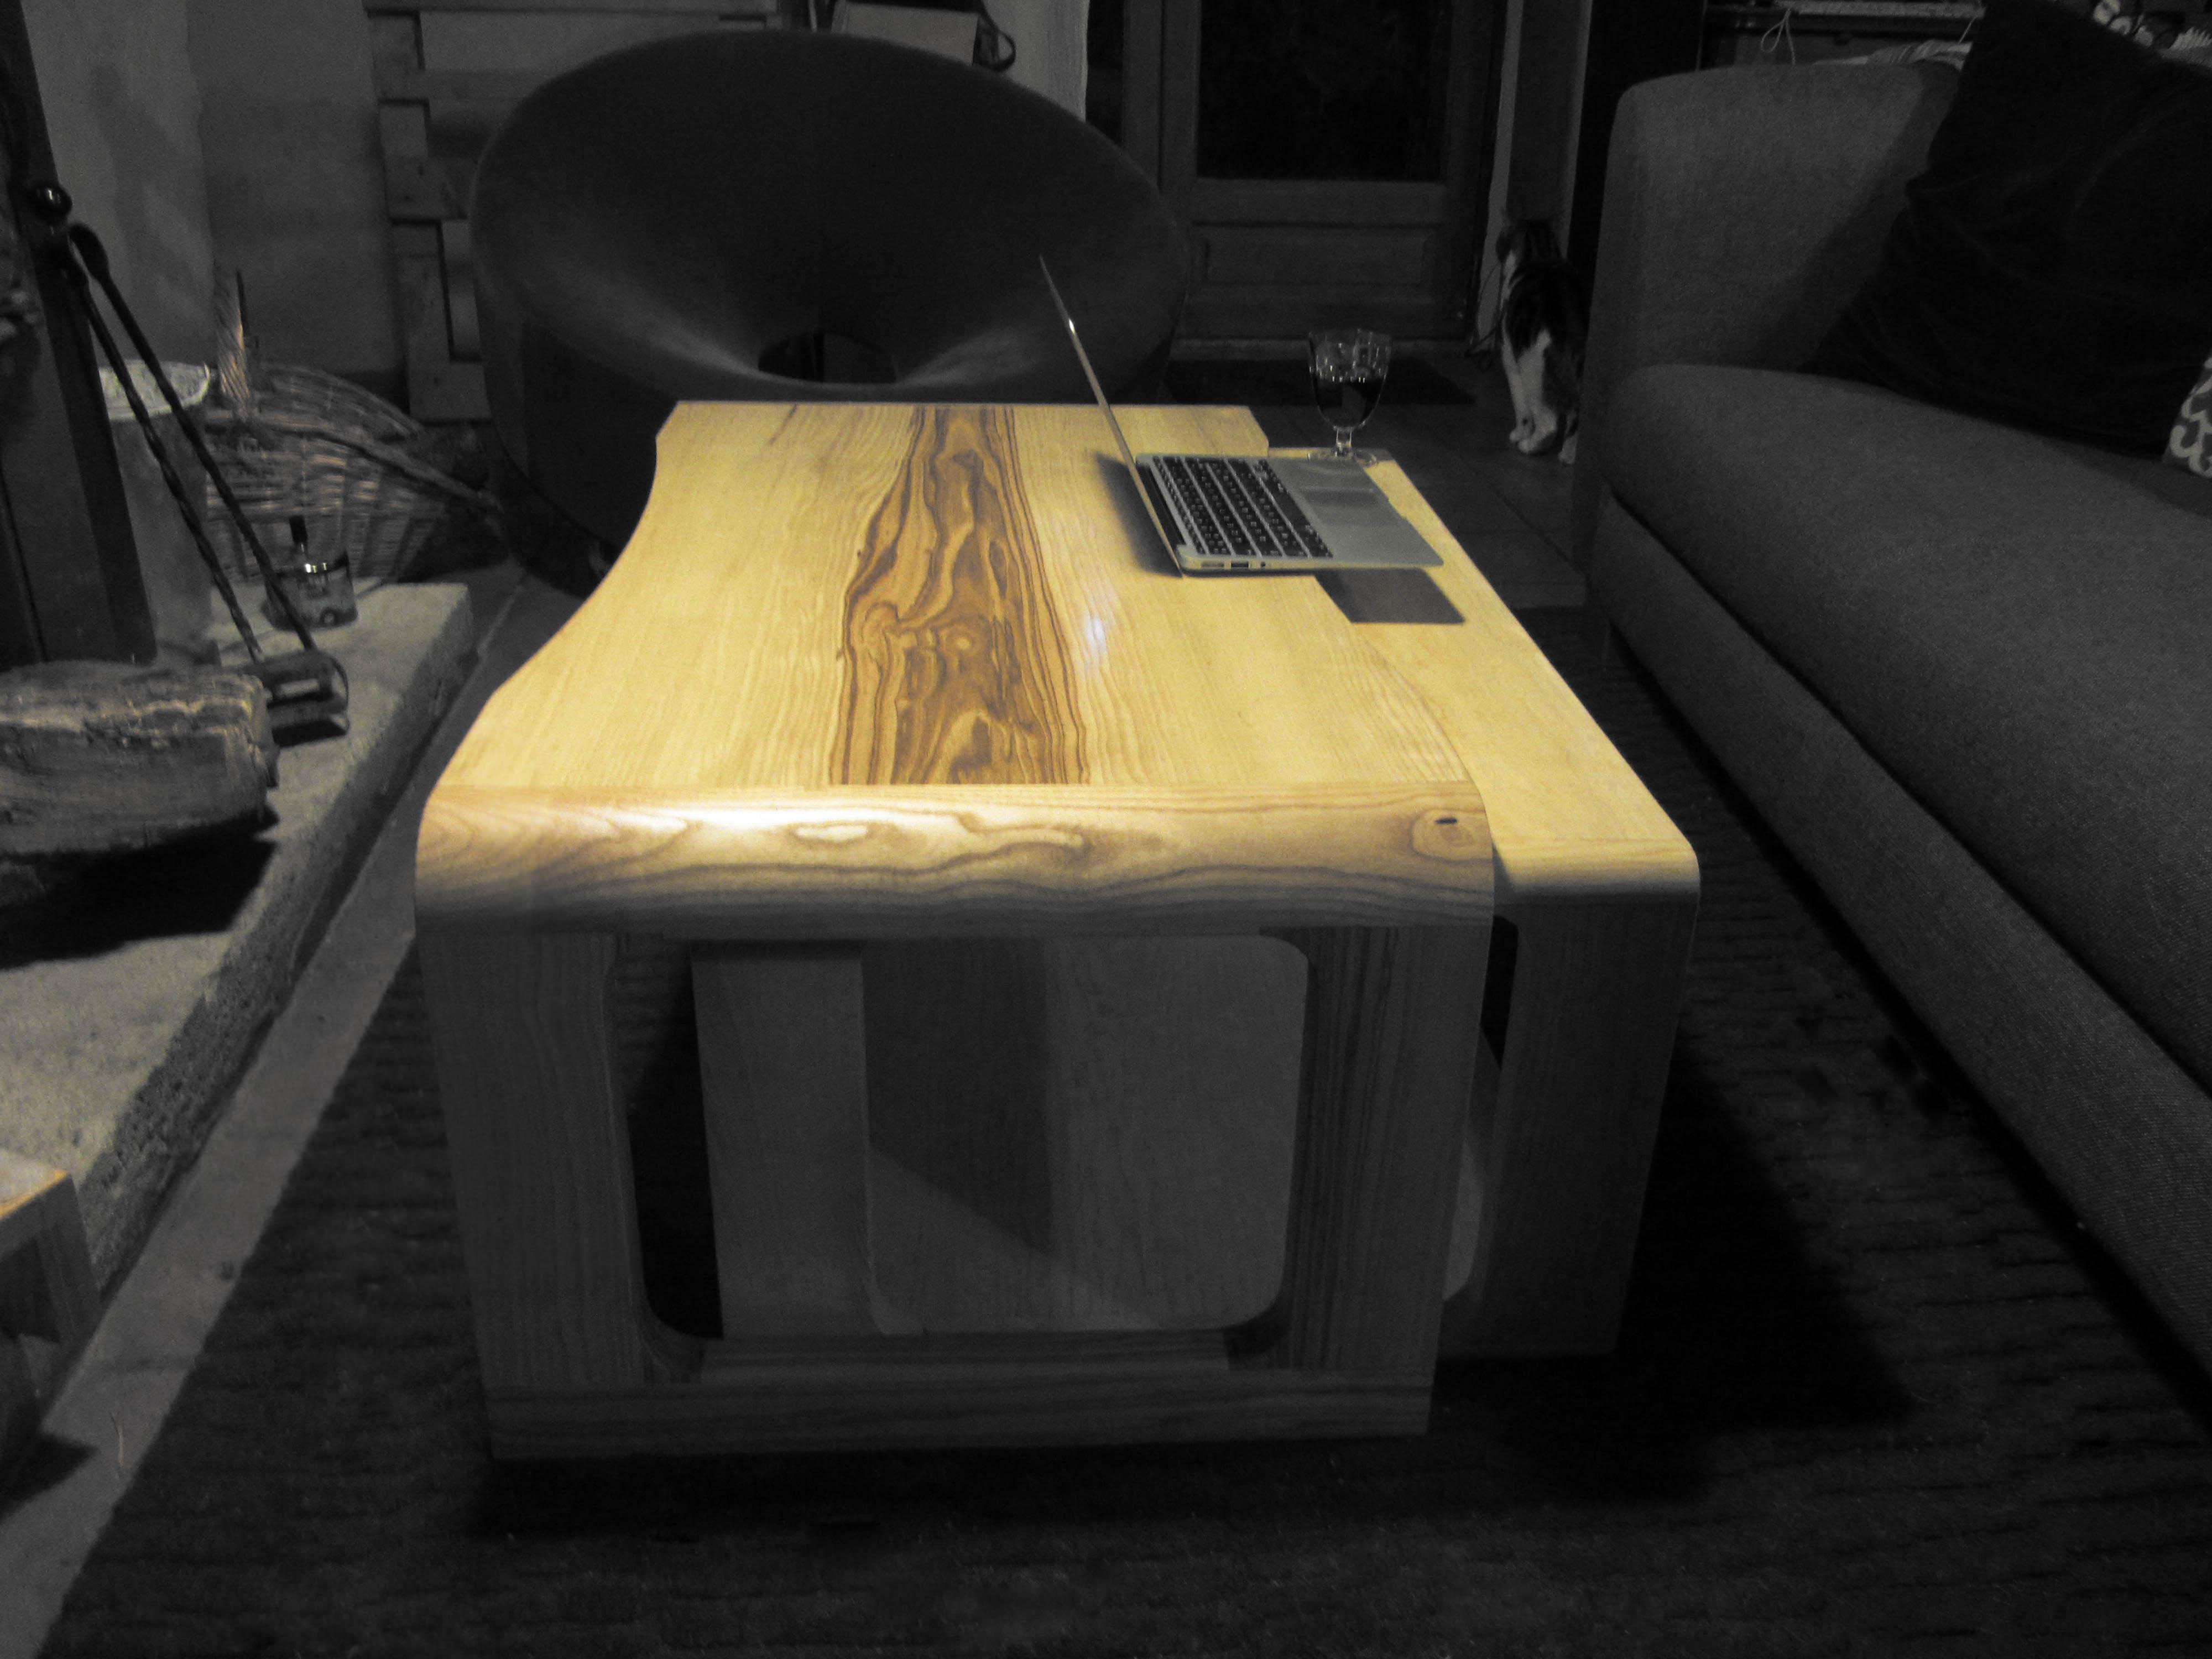 TABLE BASSE GIGOGNE STYLE 60's